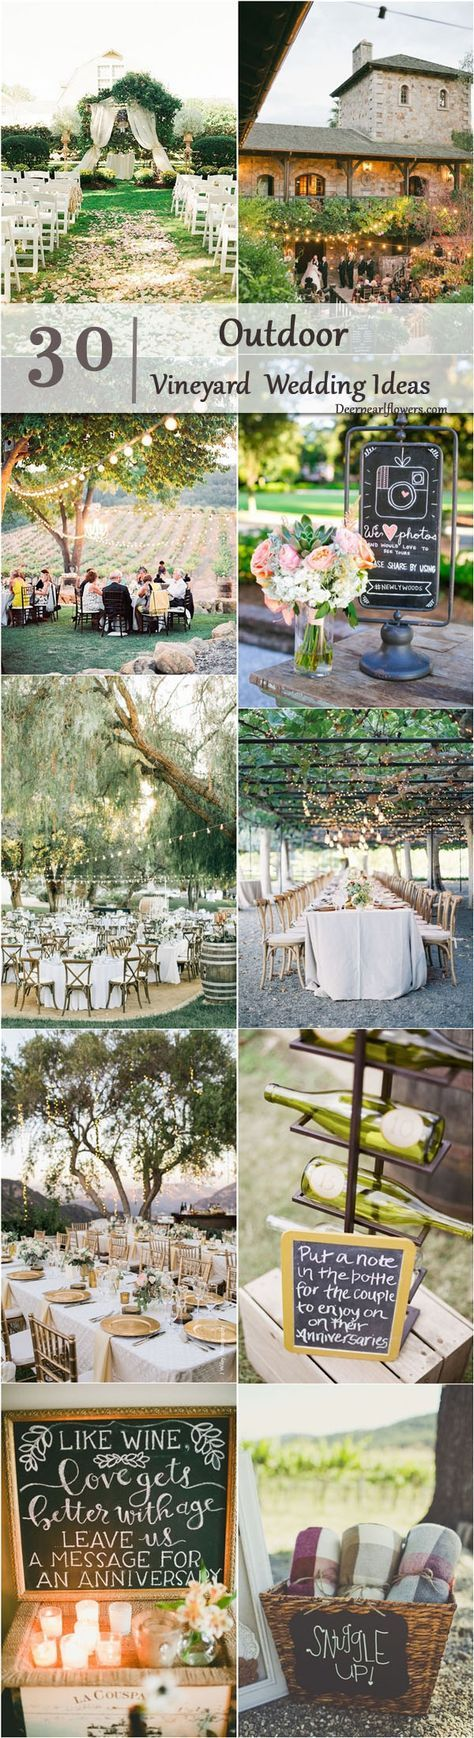 13 Best Winery Wedding Images On Pinterest Wedding Decor Floral